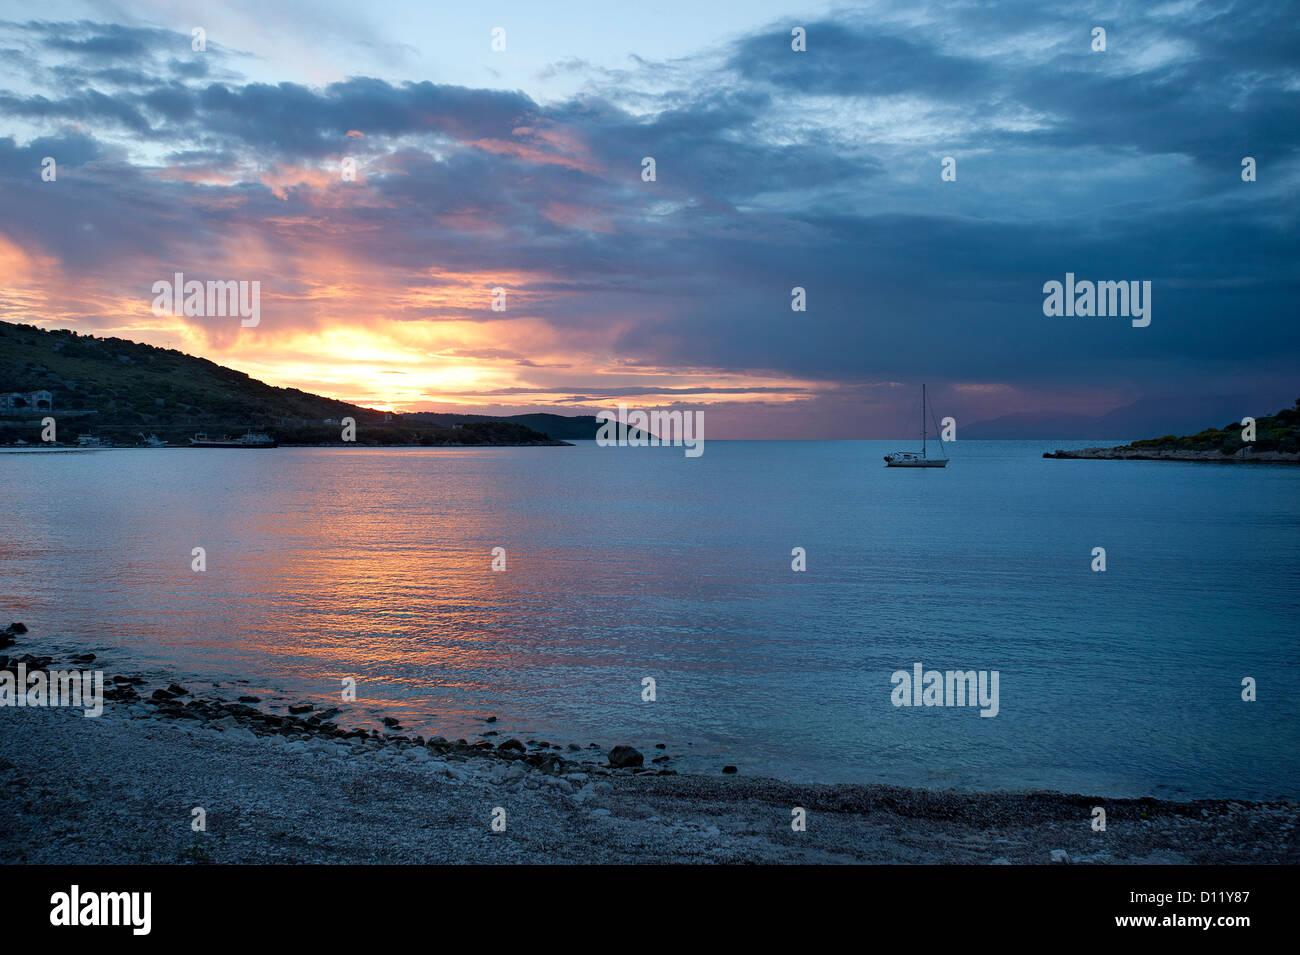 Sunset at Kassiopi Beach, Corfu, Ionian Islands, Greece - Stock Image